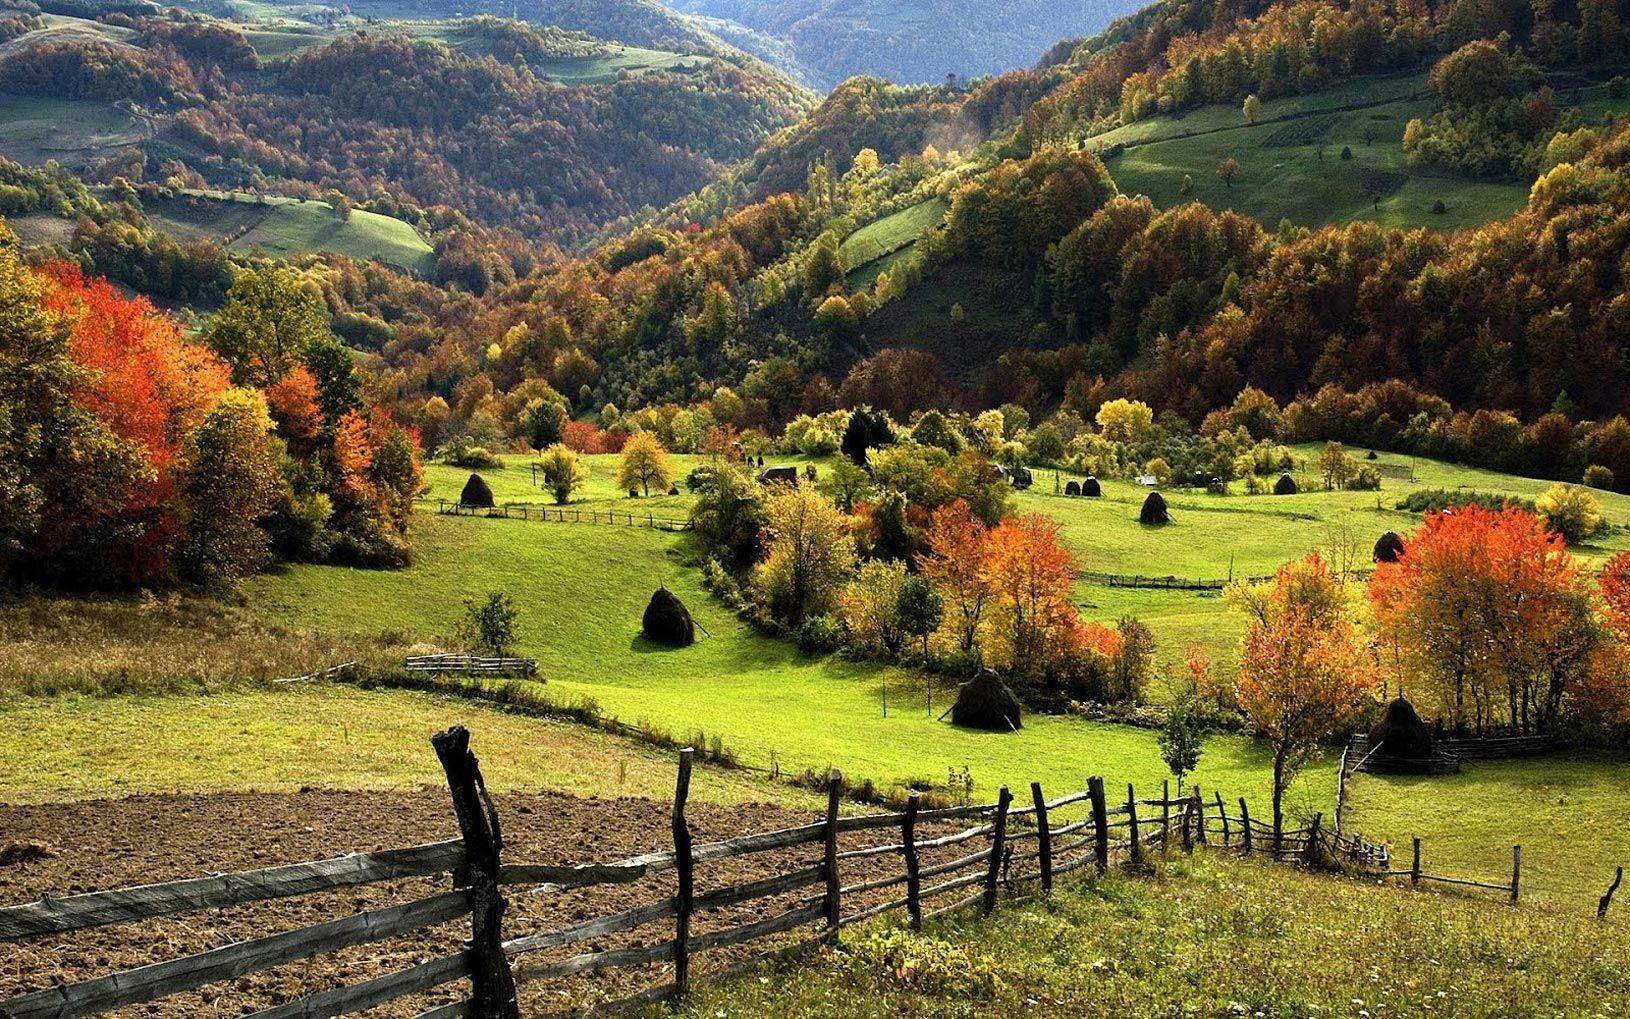 Fondos de pantalla gratis de paisajes en hd gratis para for Bajar fondos de pantalla gratis para celular